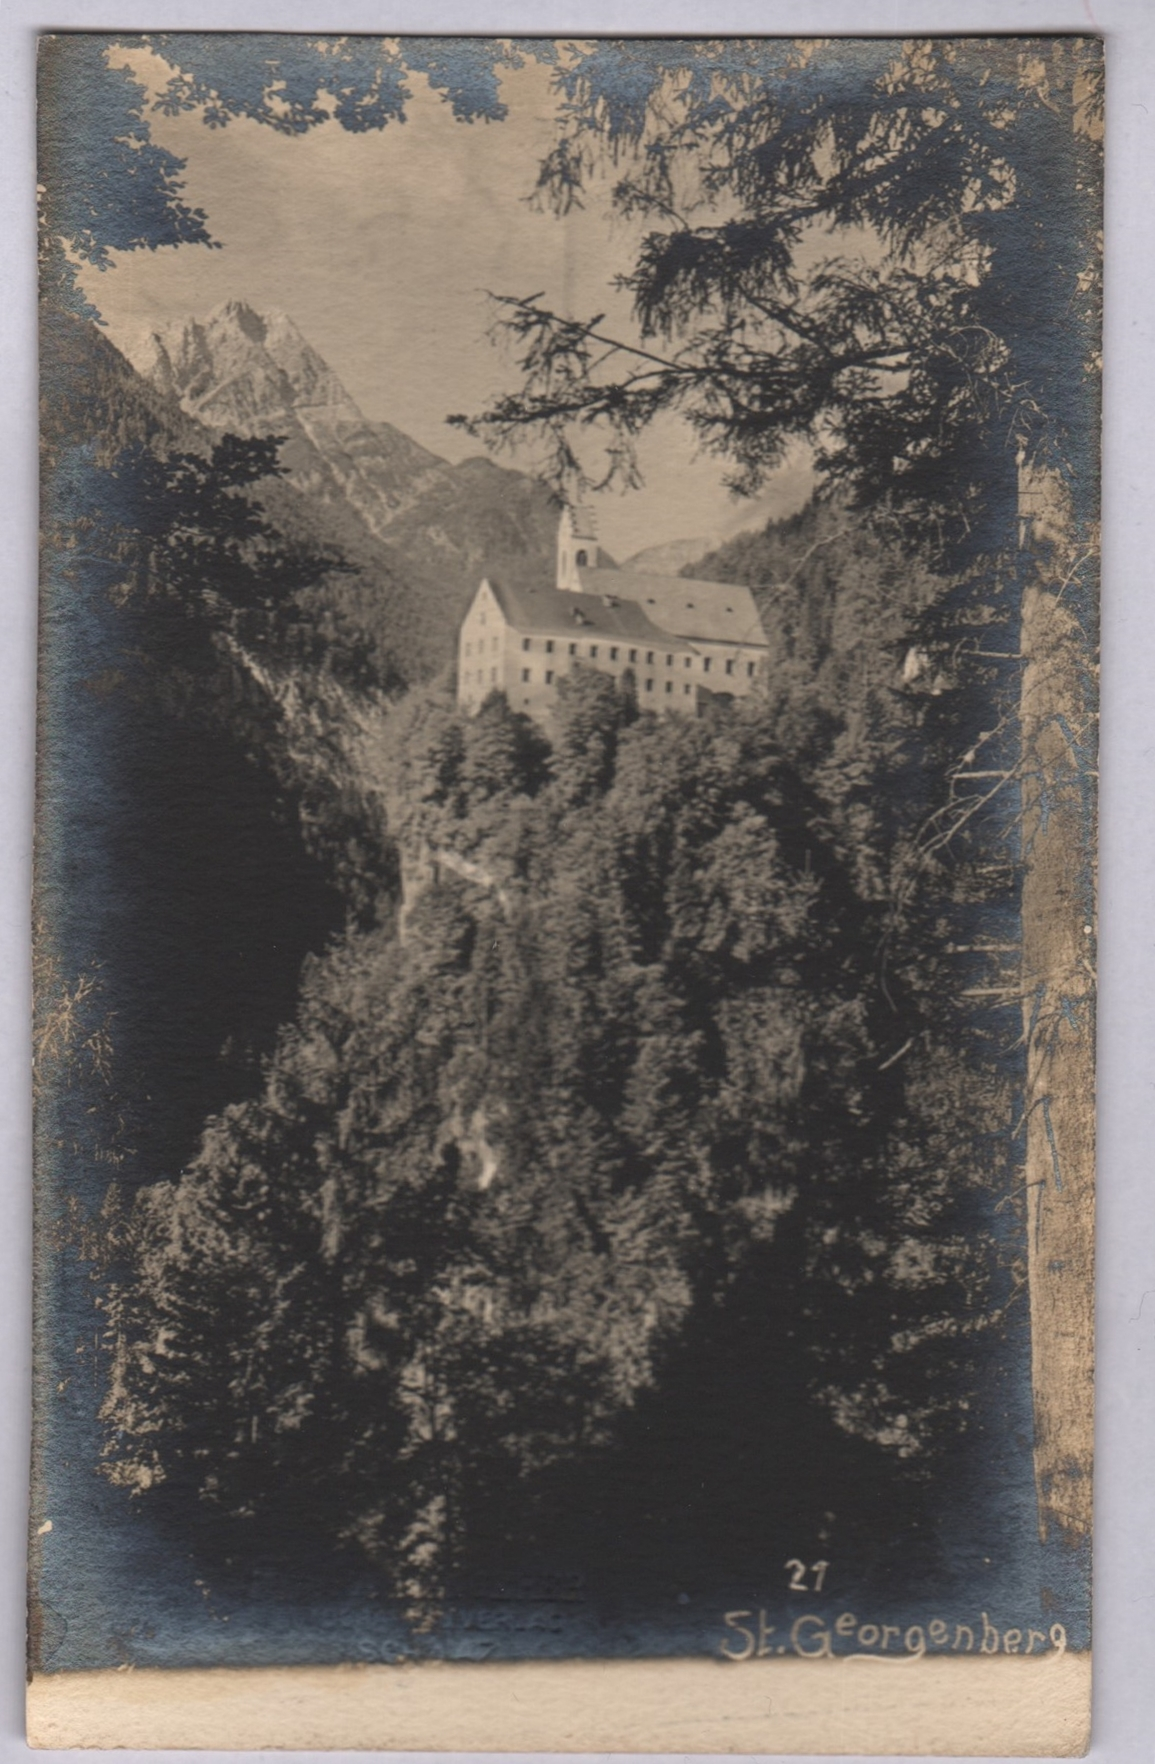 St. Georgenberg Koster 3